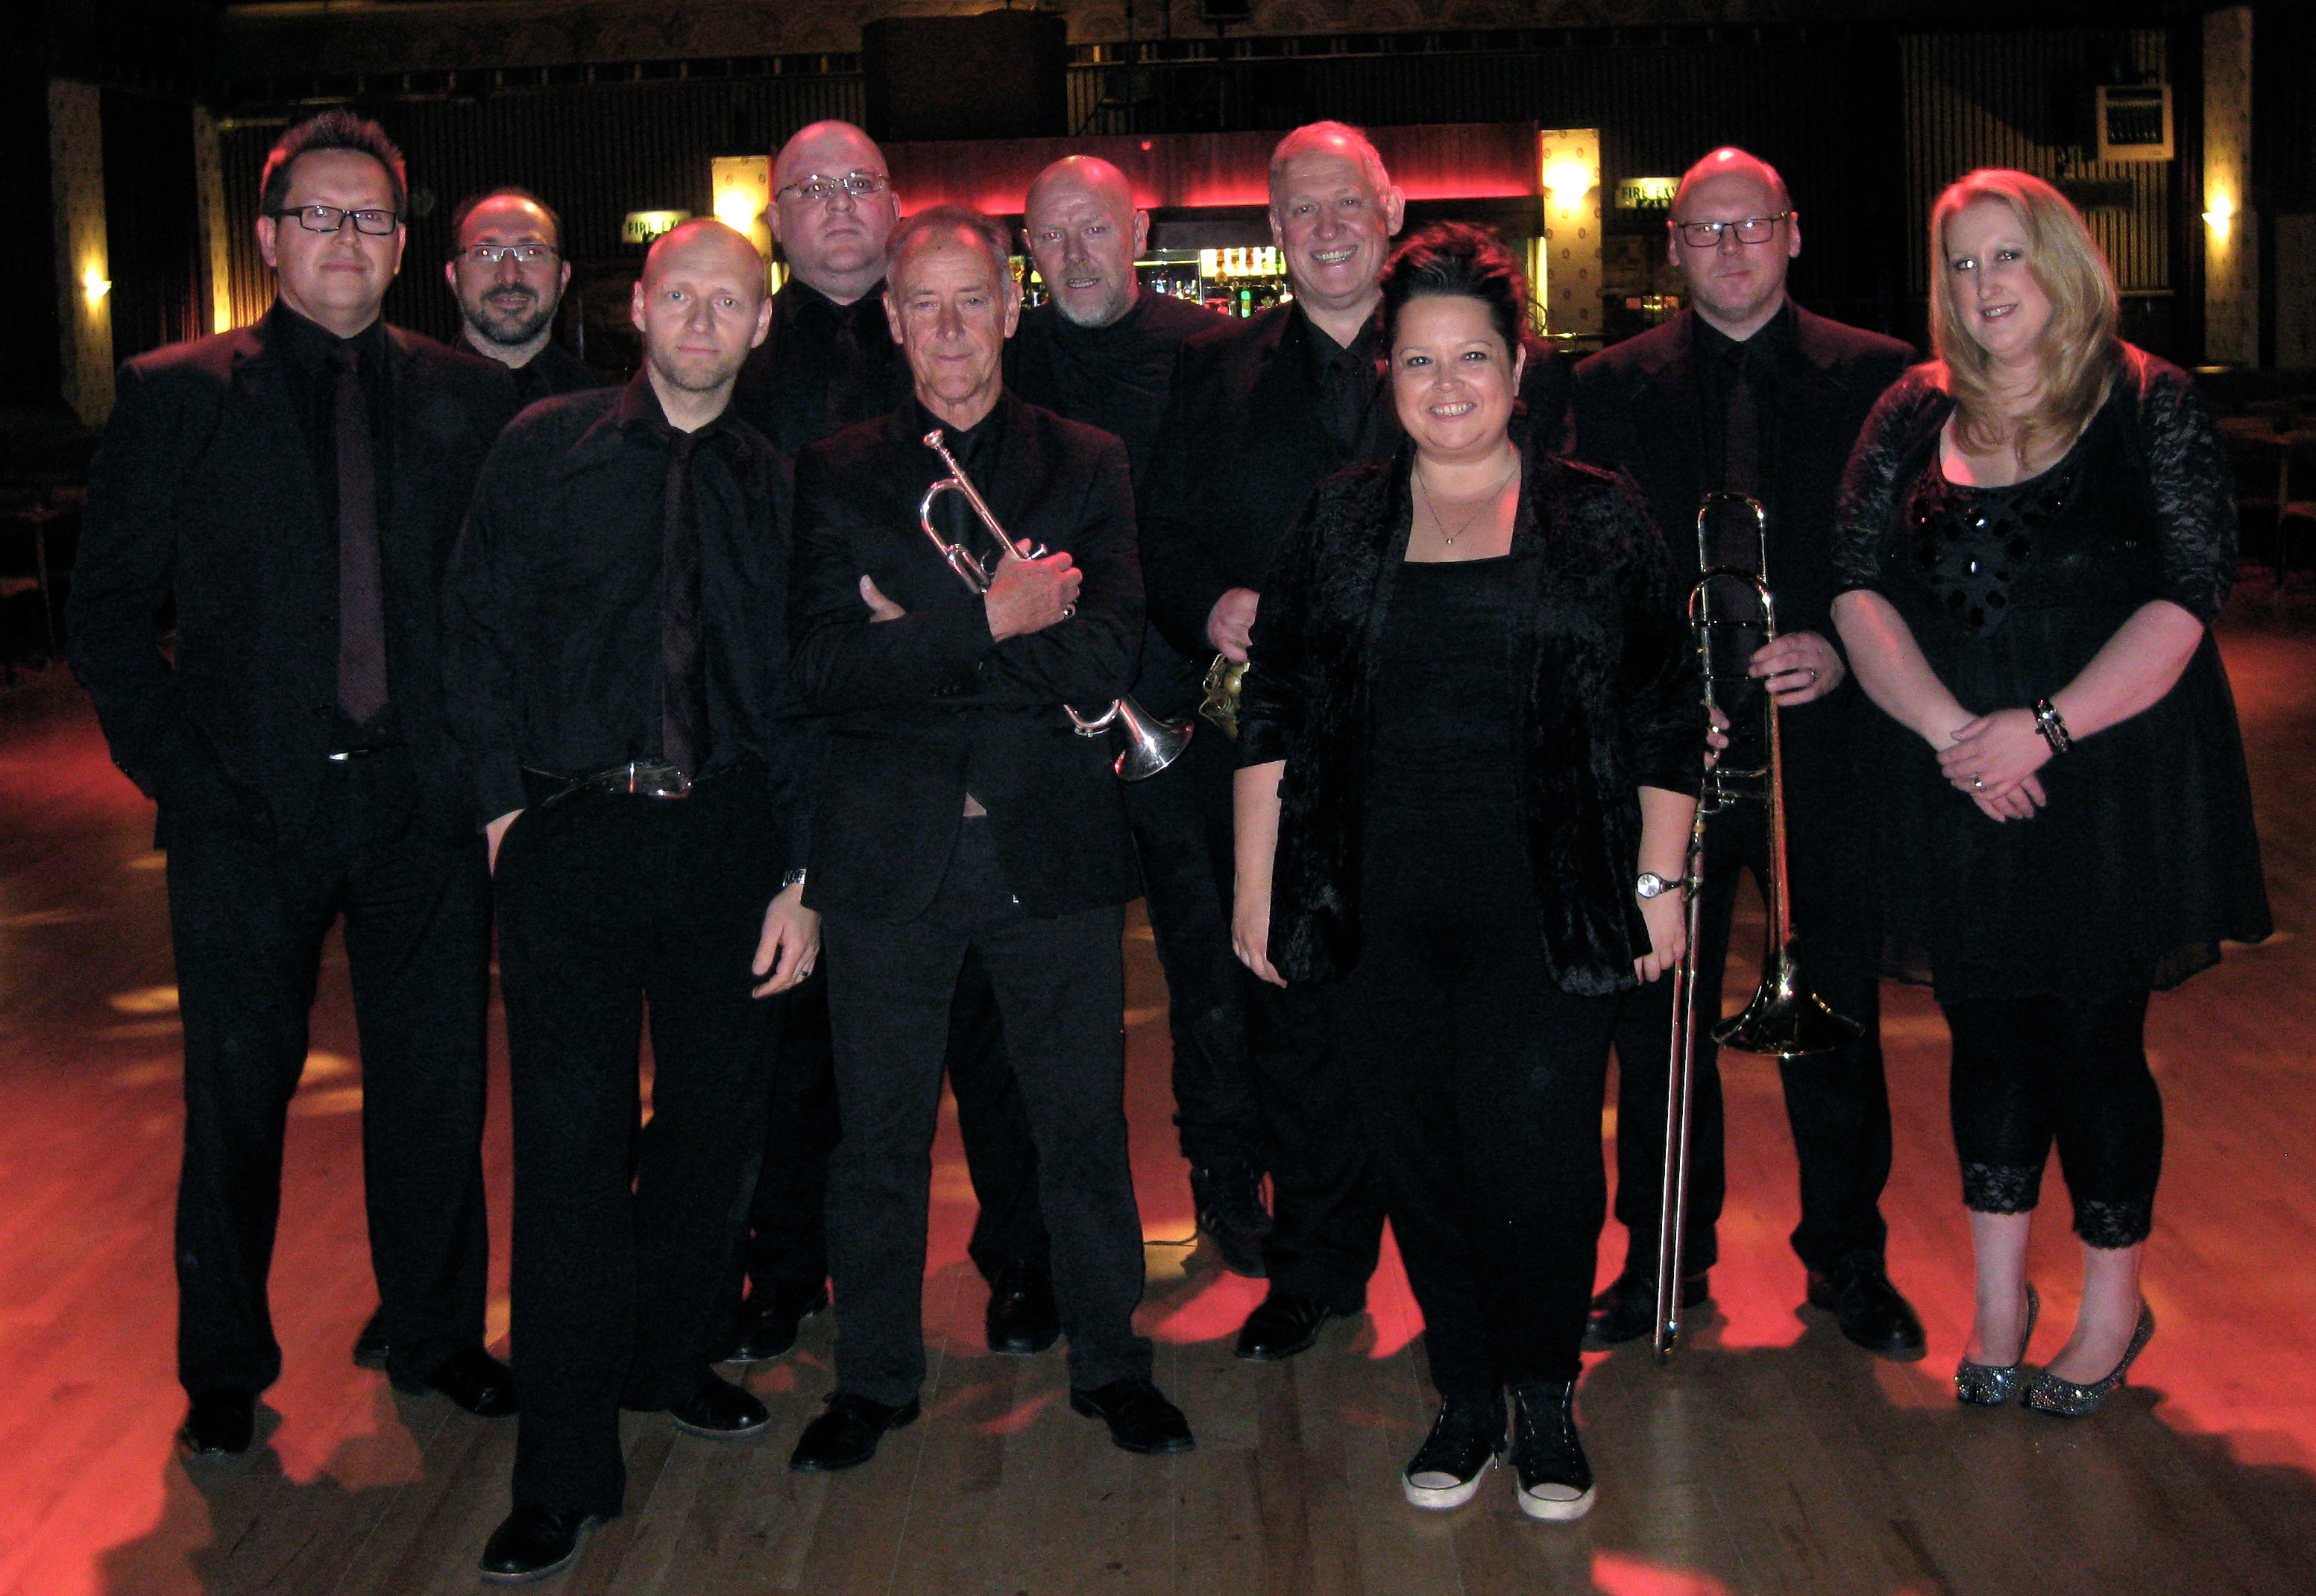 Souled As Seen - Live Soul Band